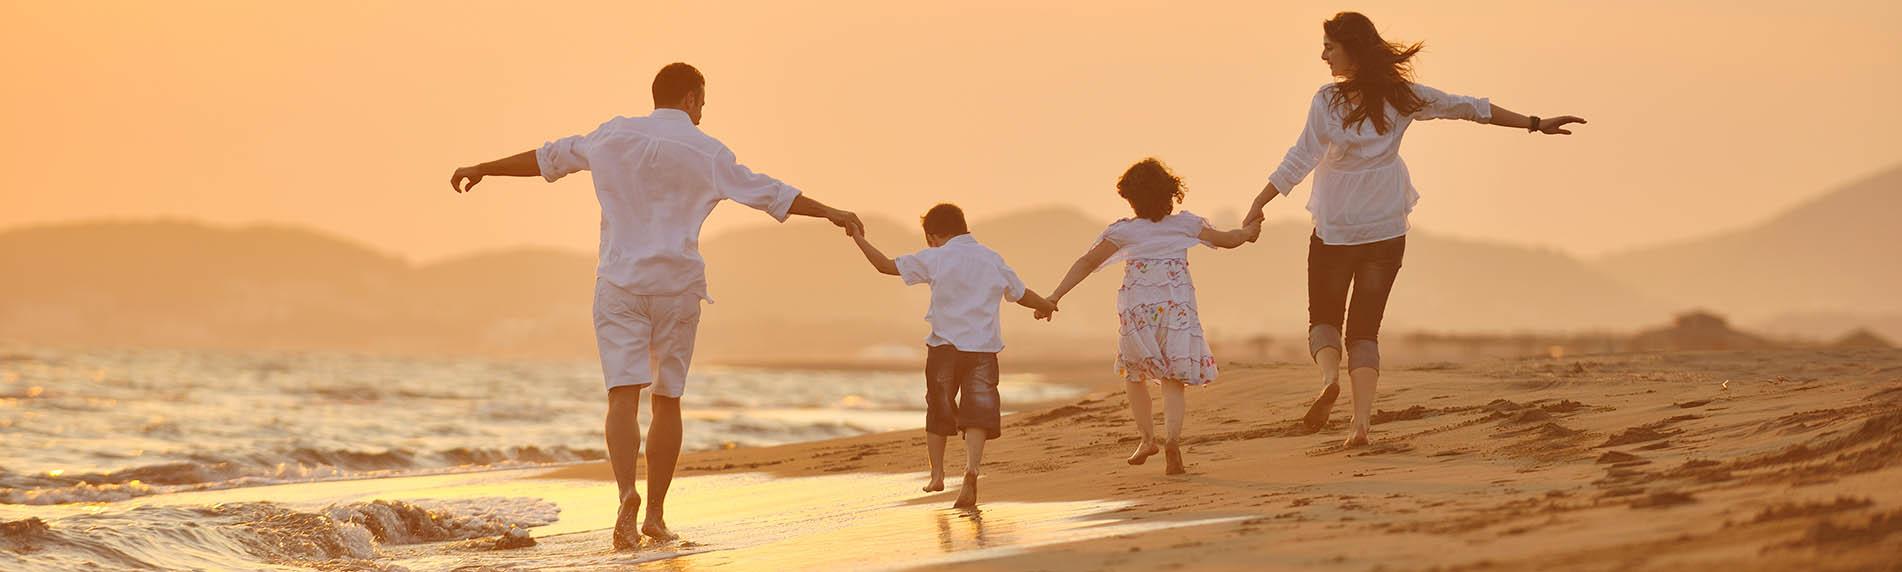 Abu Dhabi Family Break